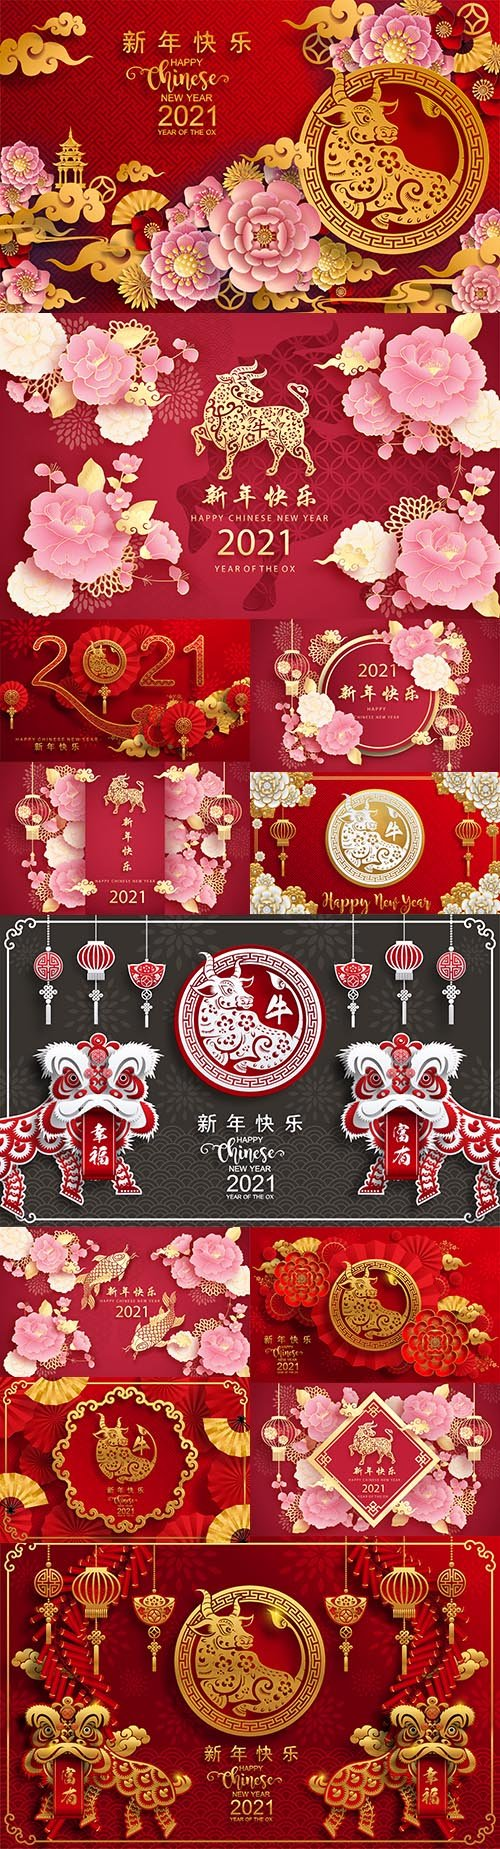 Happy Chinese New Year 2021 bright decorative design